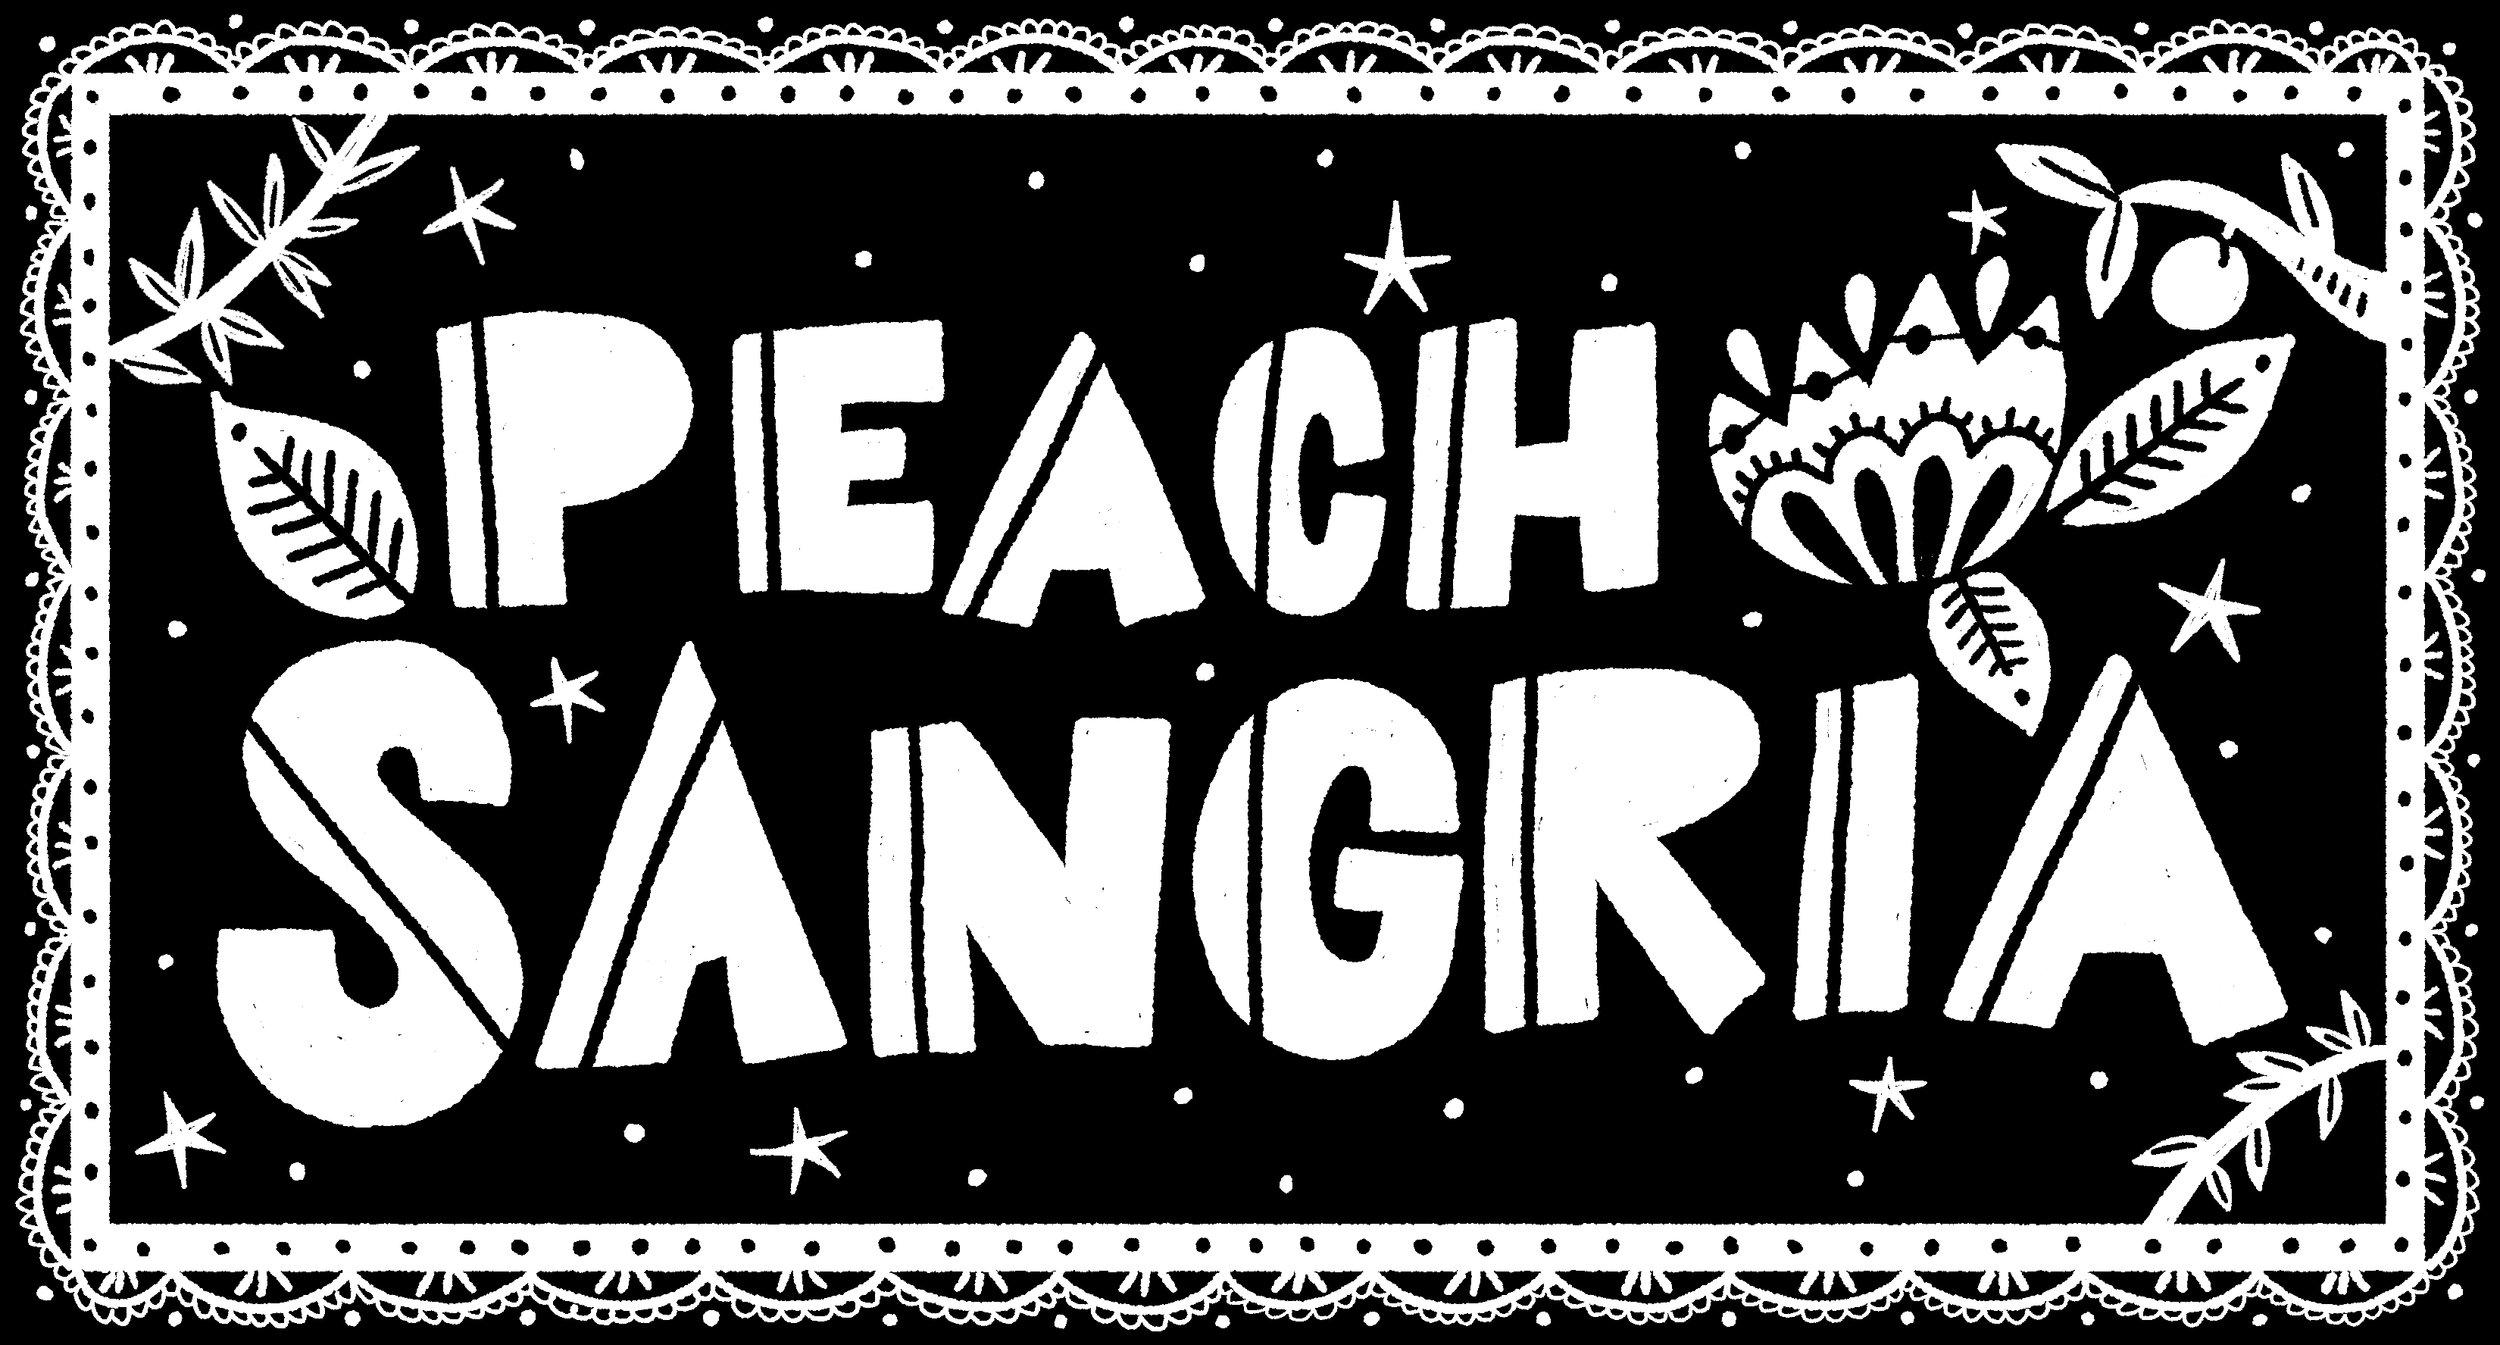 006-PeachSangria.jpg